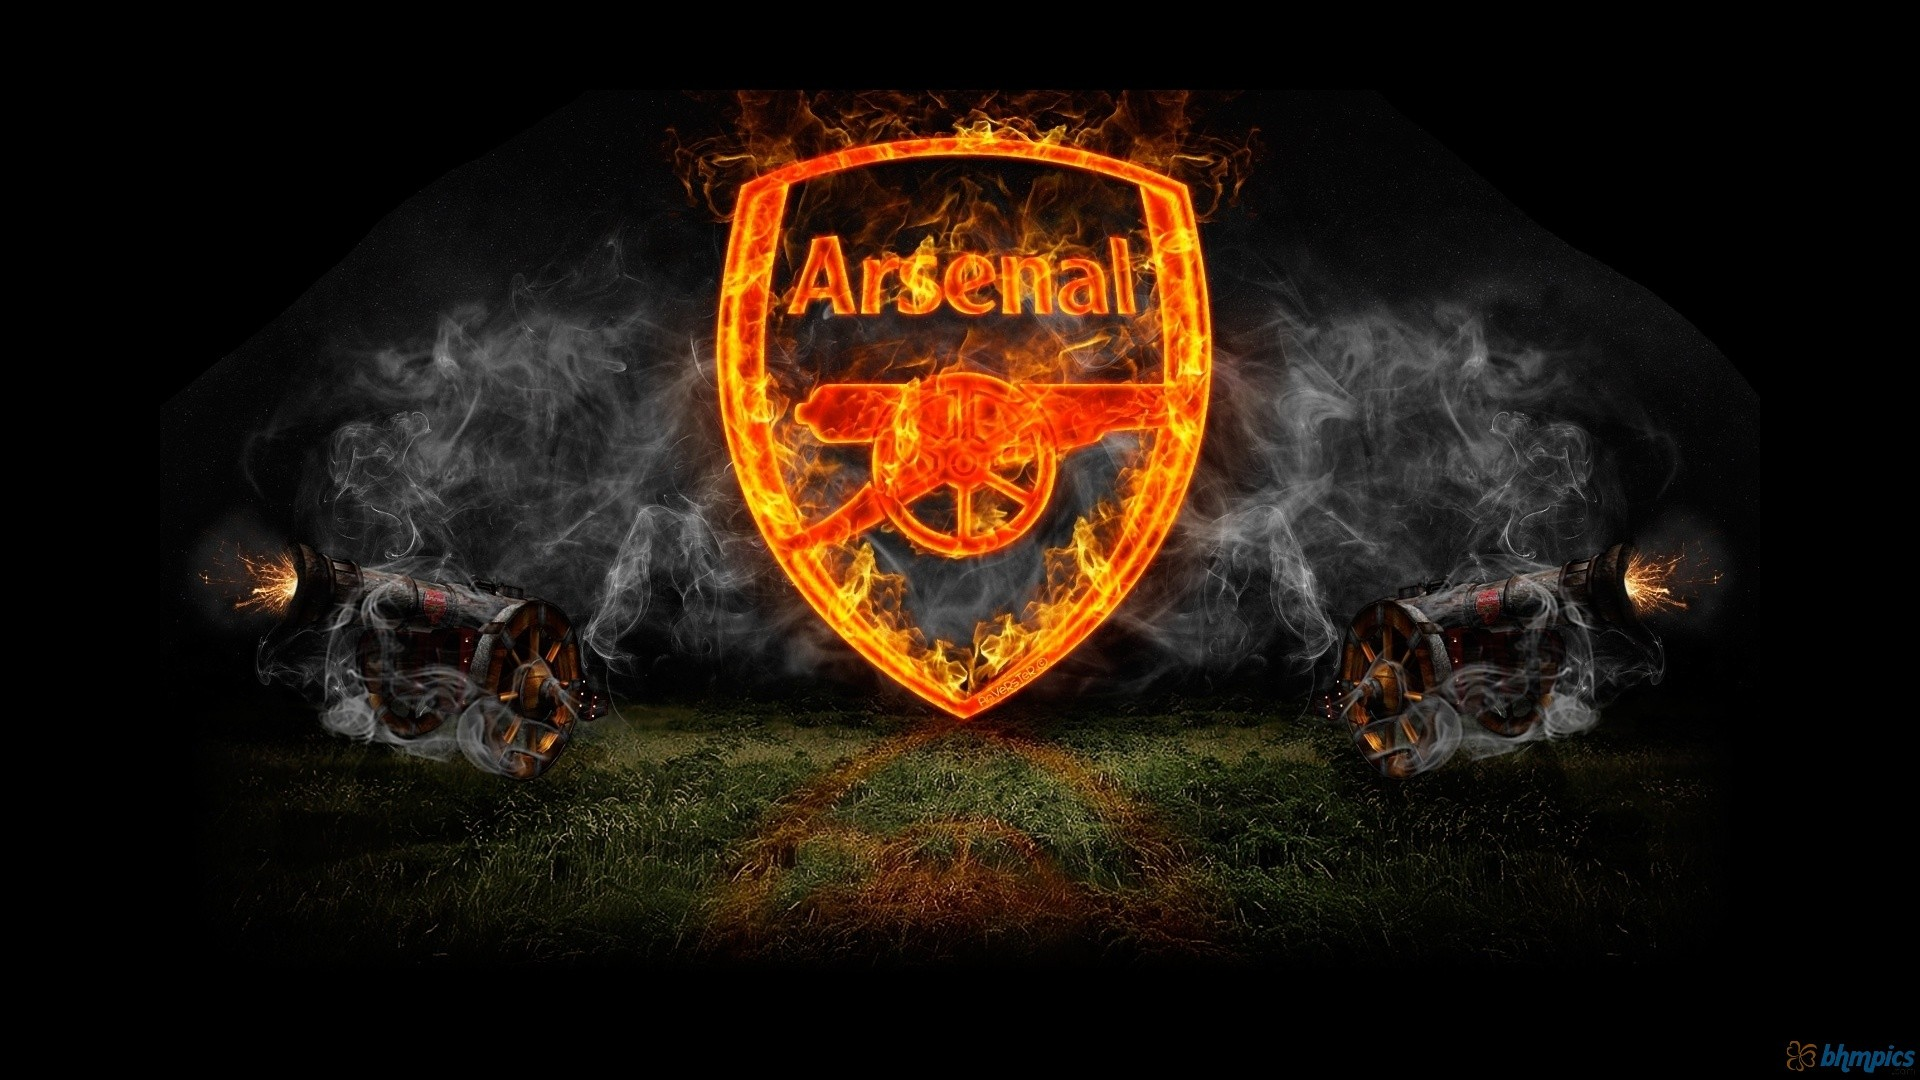 Arsenal FC Football Logo HD Wallpaper of Football 1920x1080